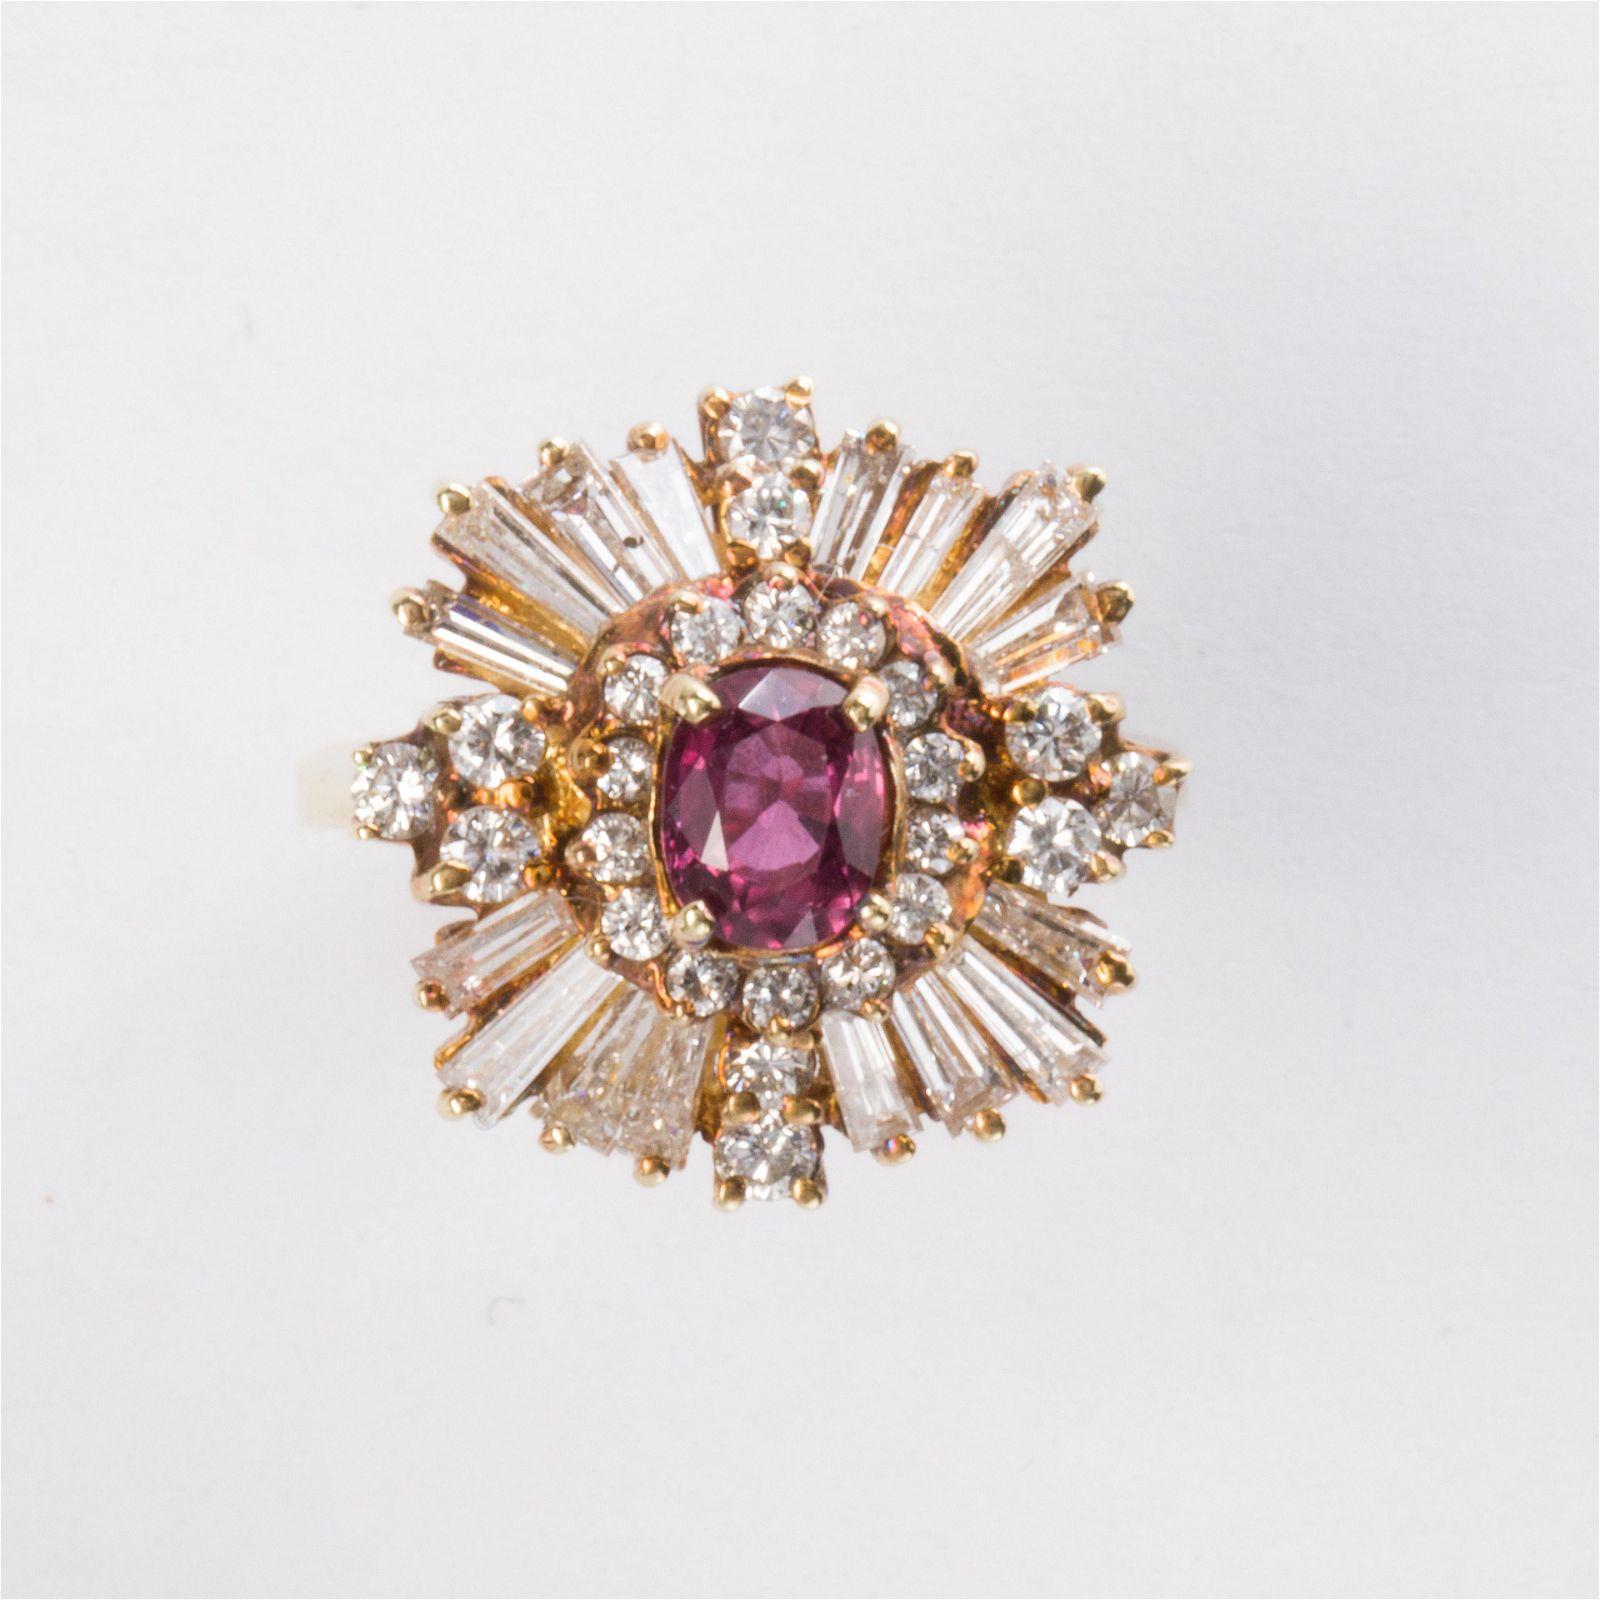 A ruby, diamond and fourteen karat gold ring